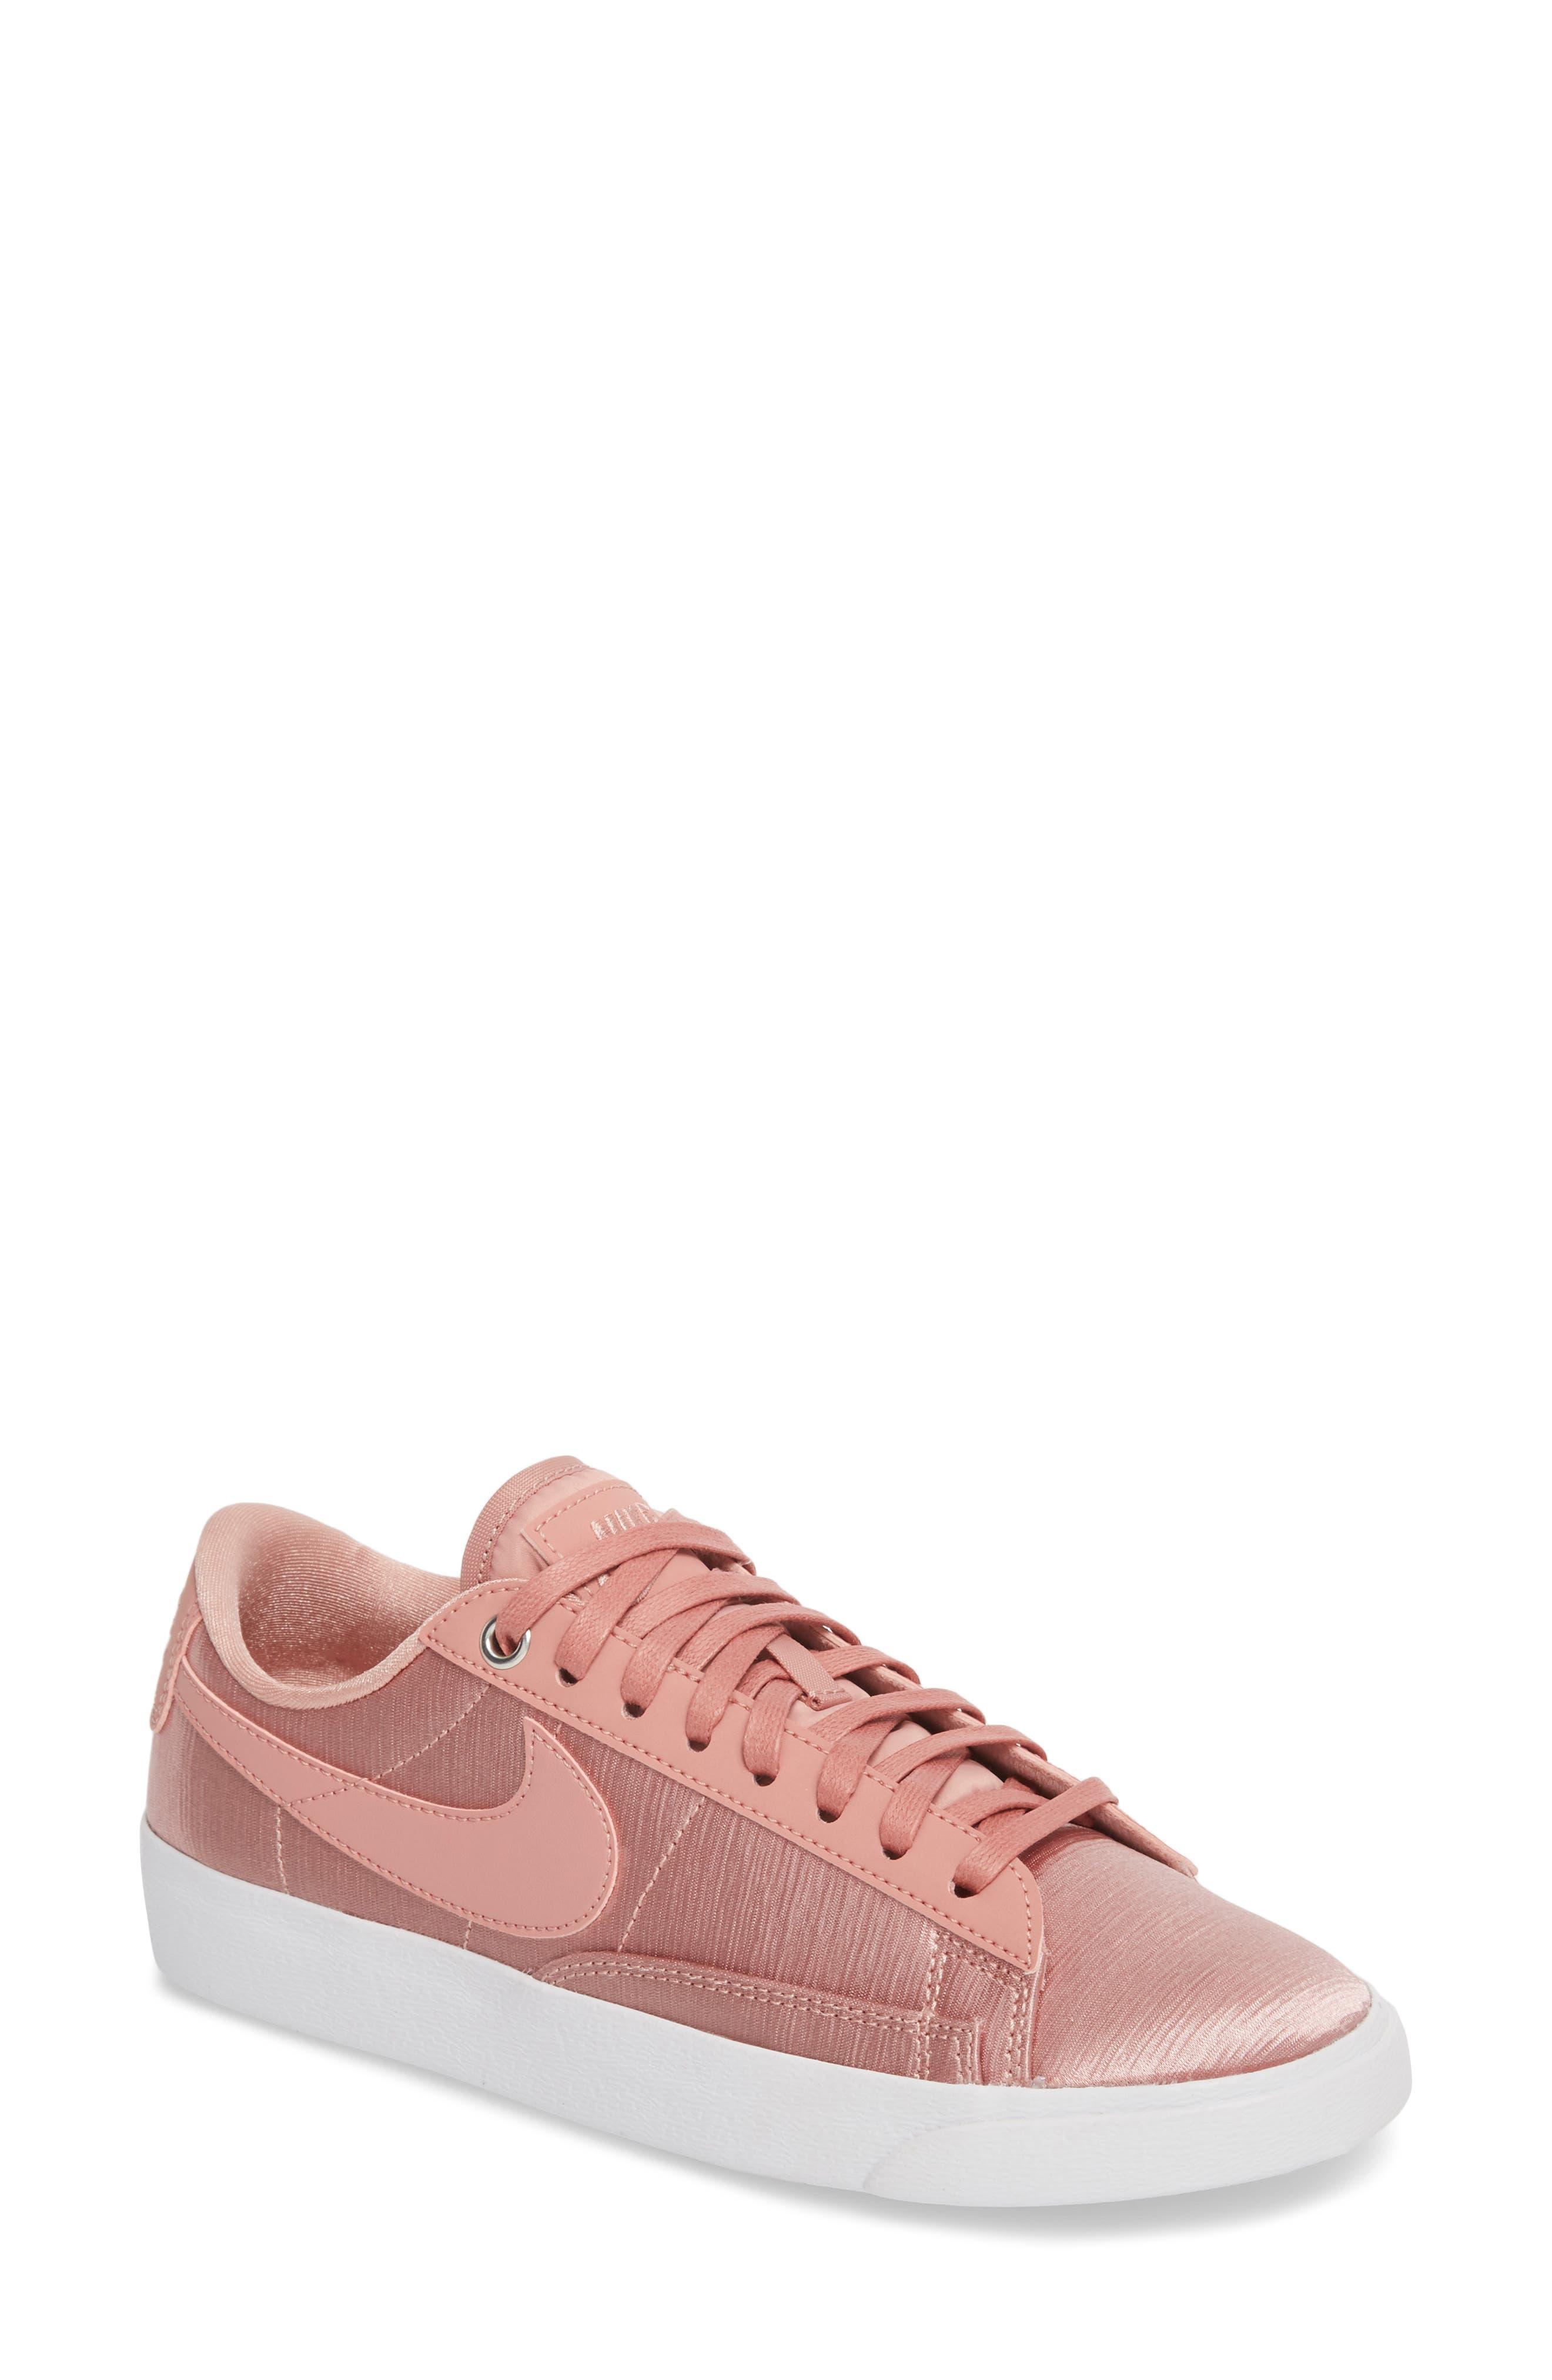 Blazer Low SE Sneaker,                             Main thumbnail 1, color,                             RUST PINK/ RUST PINK